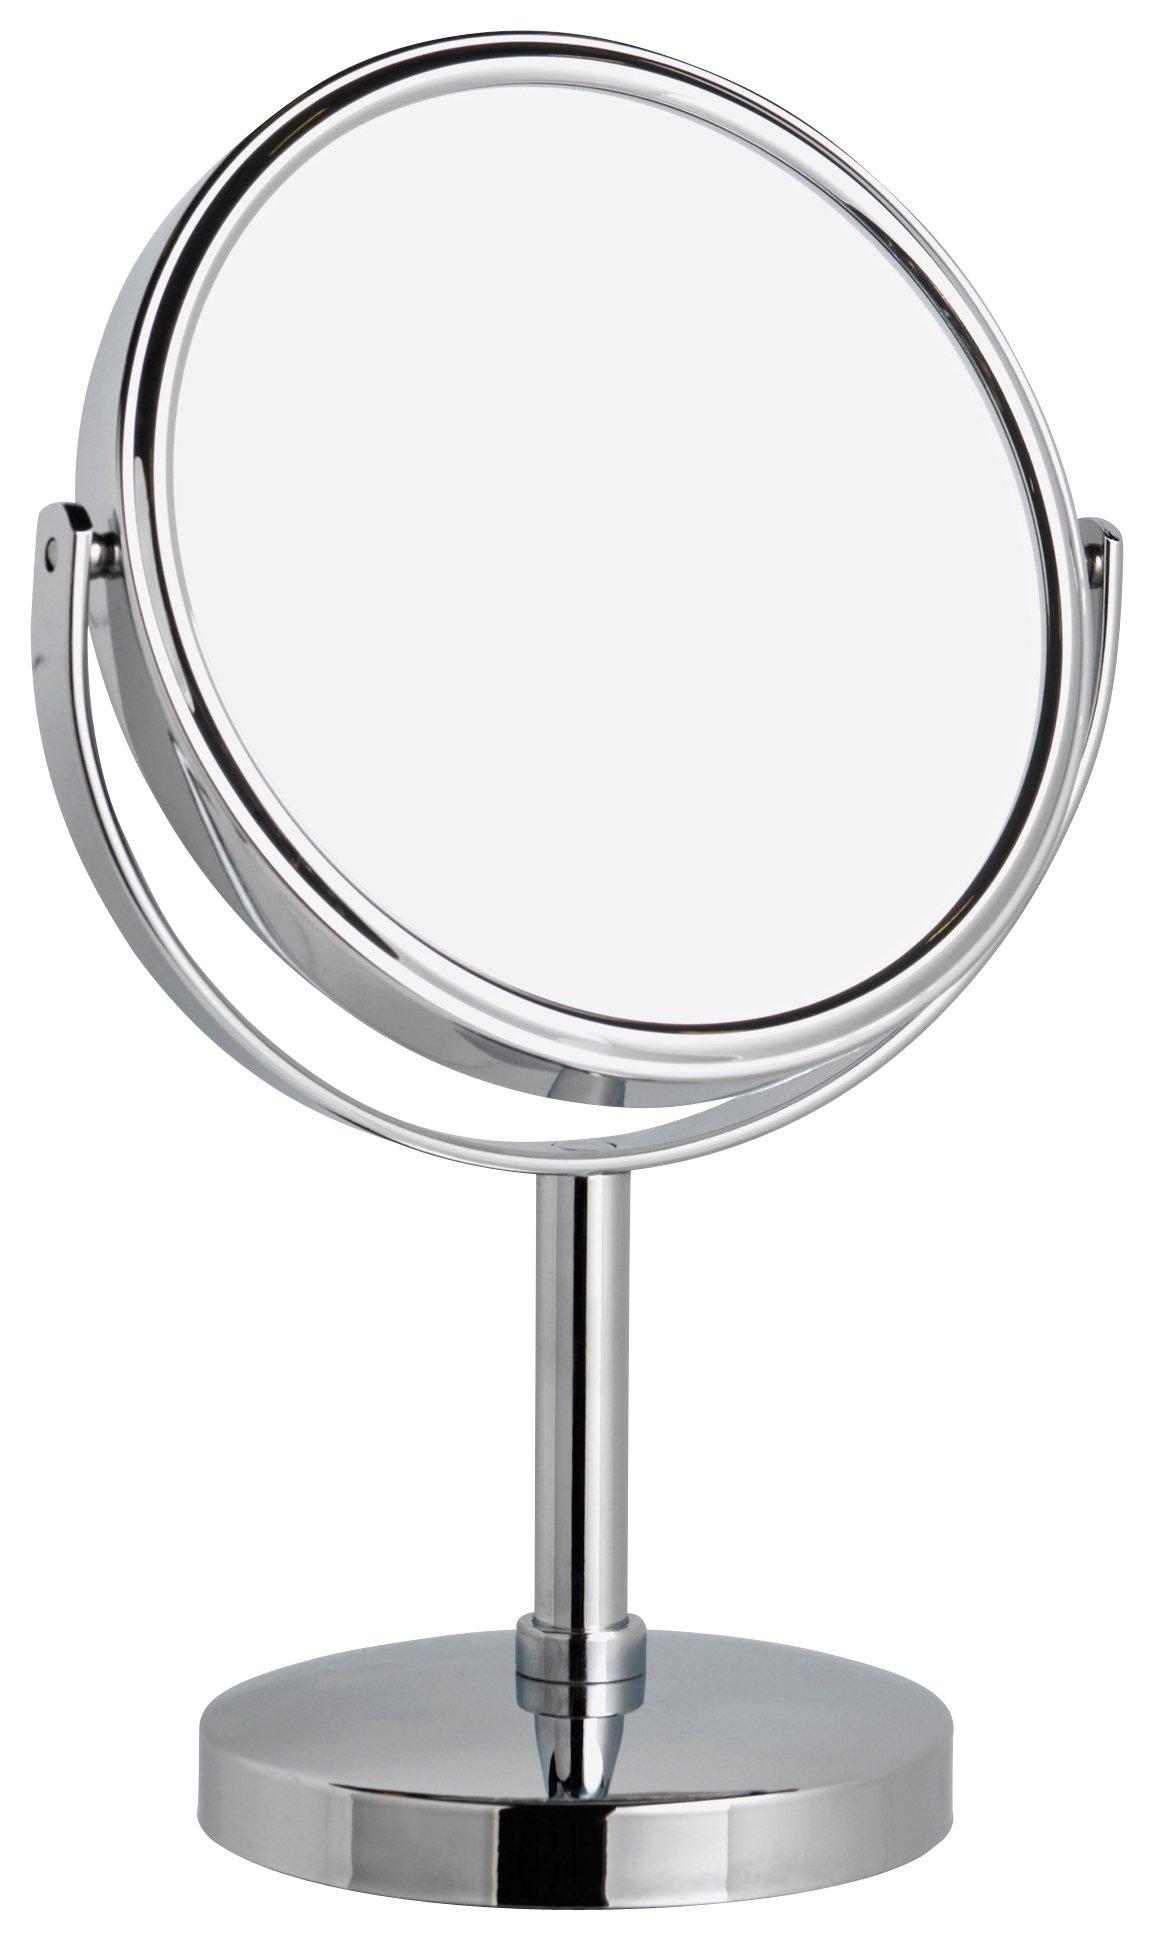 Danielle Creations Chrome Beauty Mirror